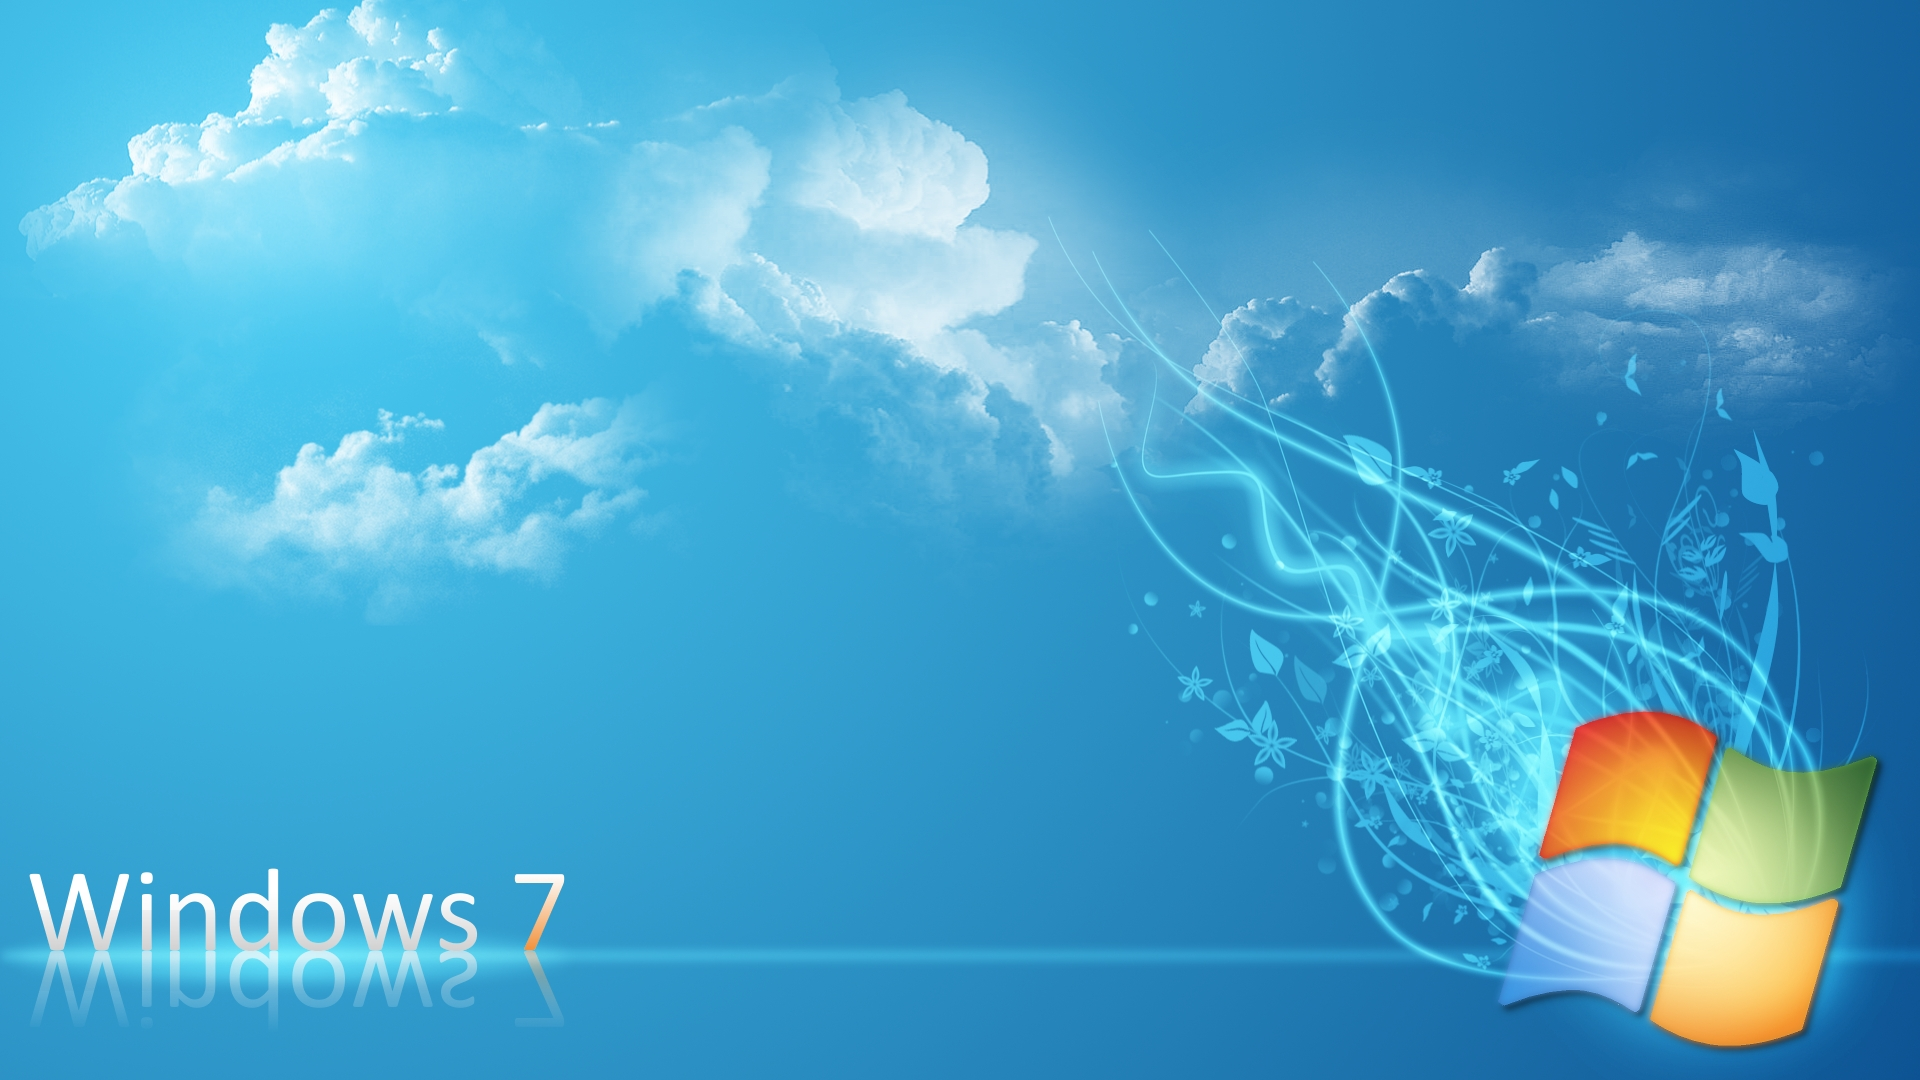 hd s windows cloudy desktop wallpaper